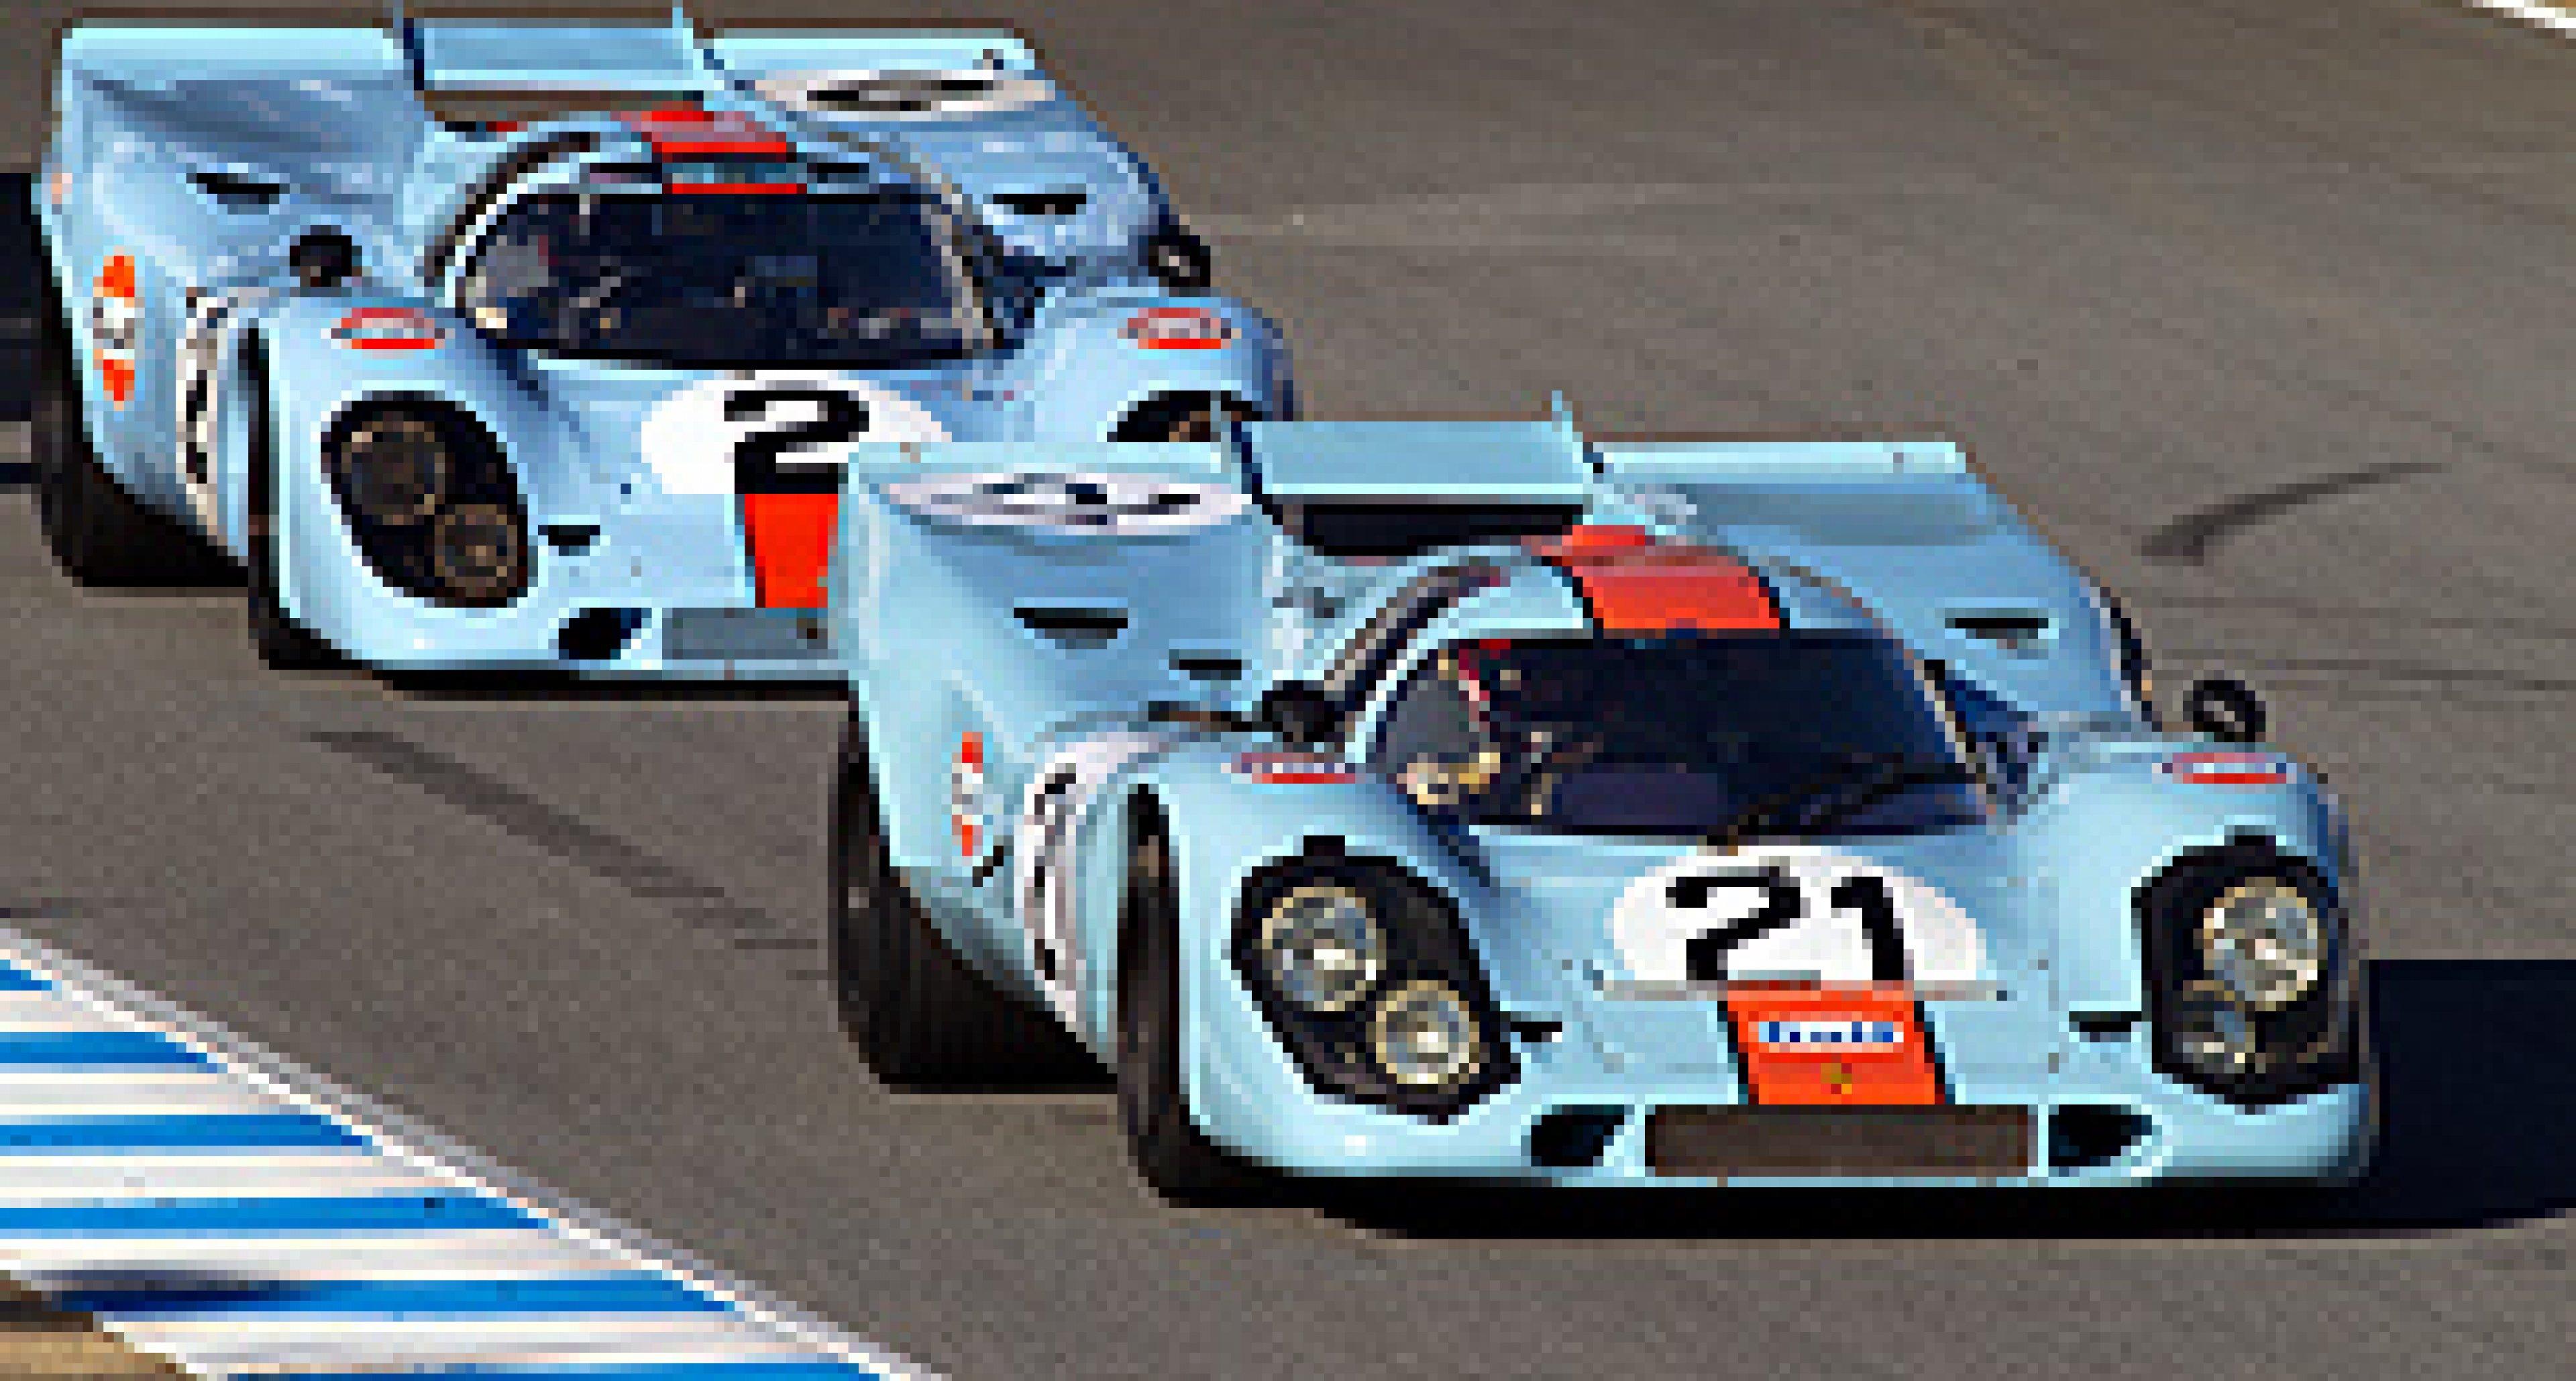 Porsche Rennsport Reunion IV: Photo gallery tells the story